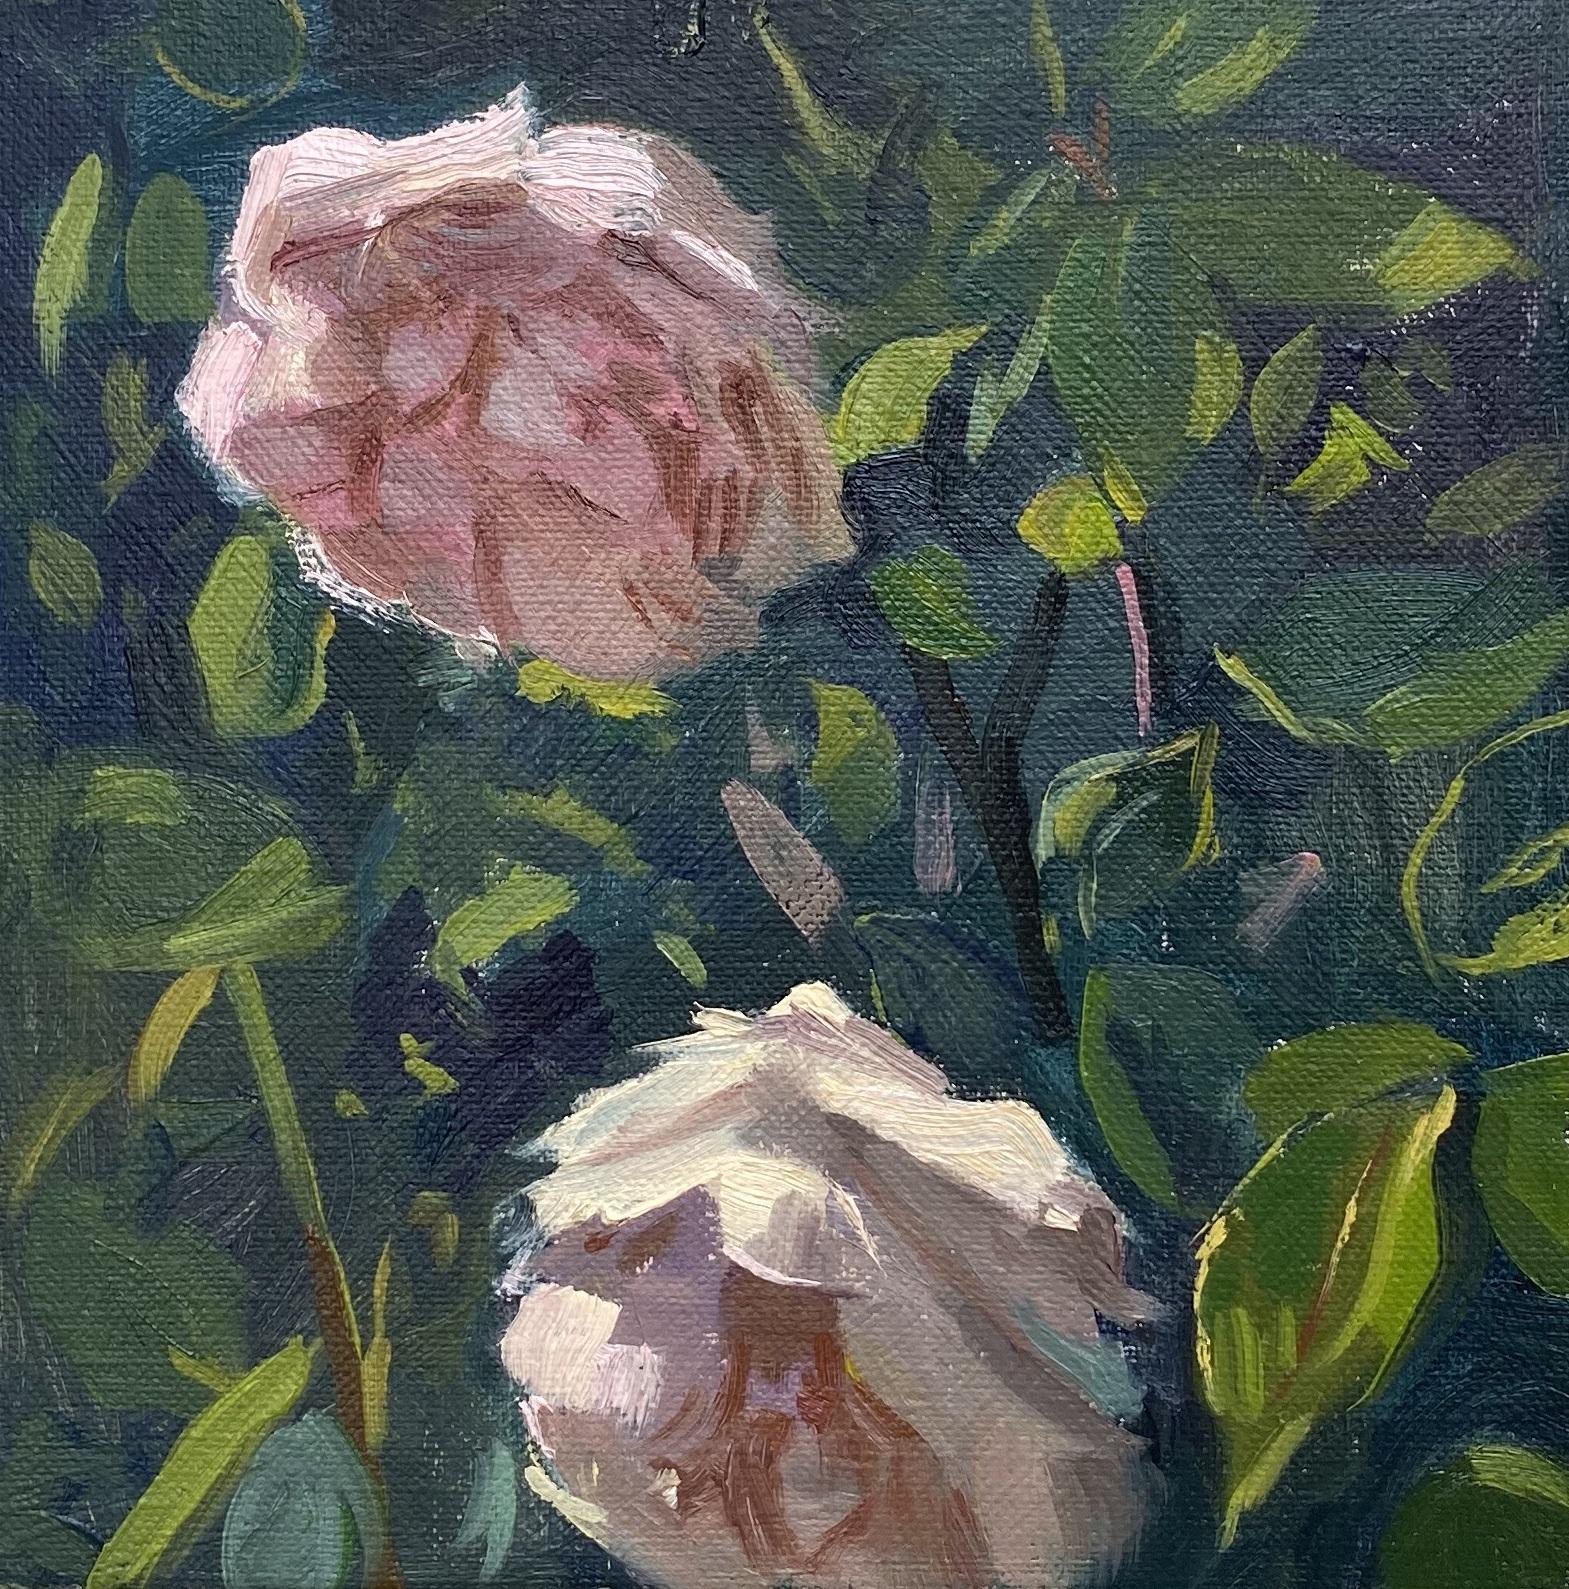 Sunlight on David Austen Roses in the garden